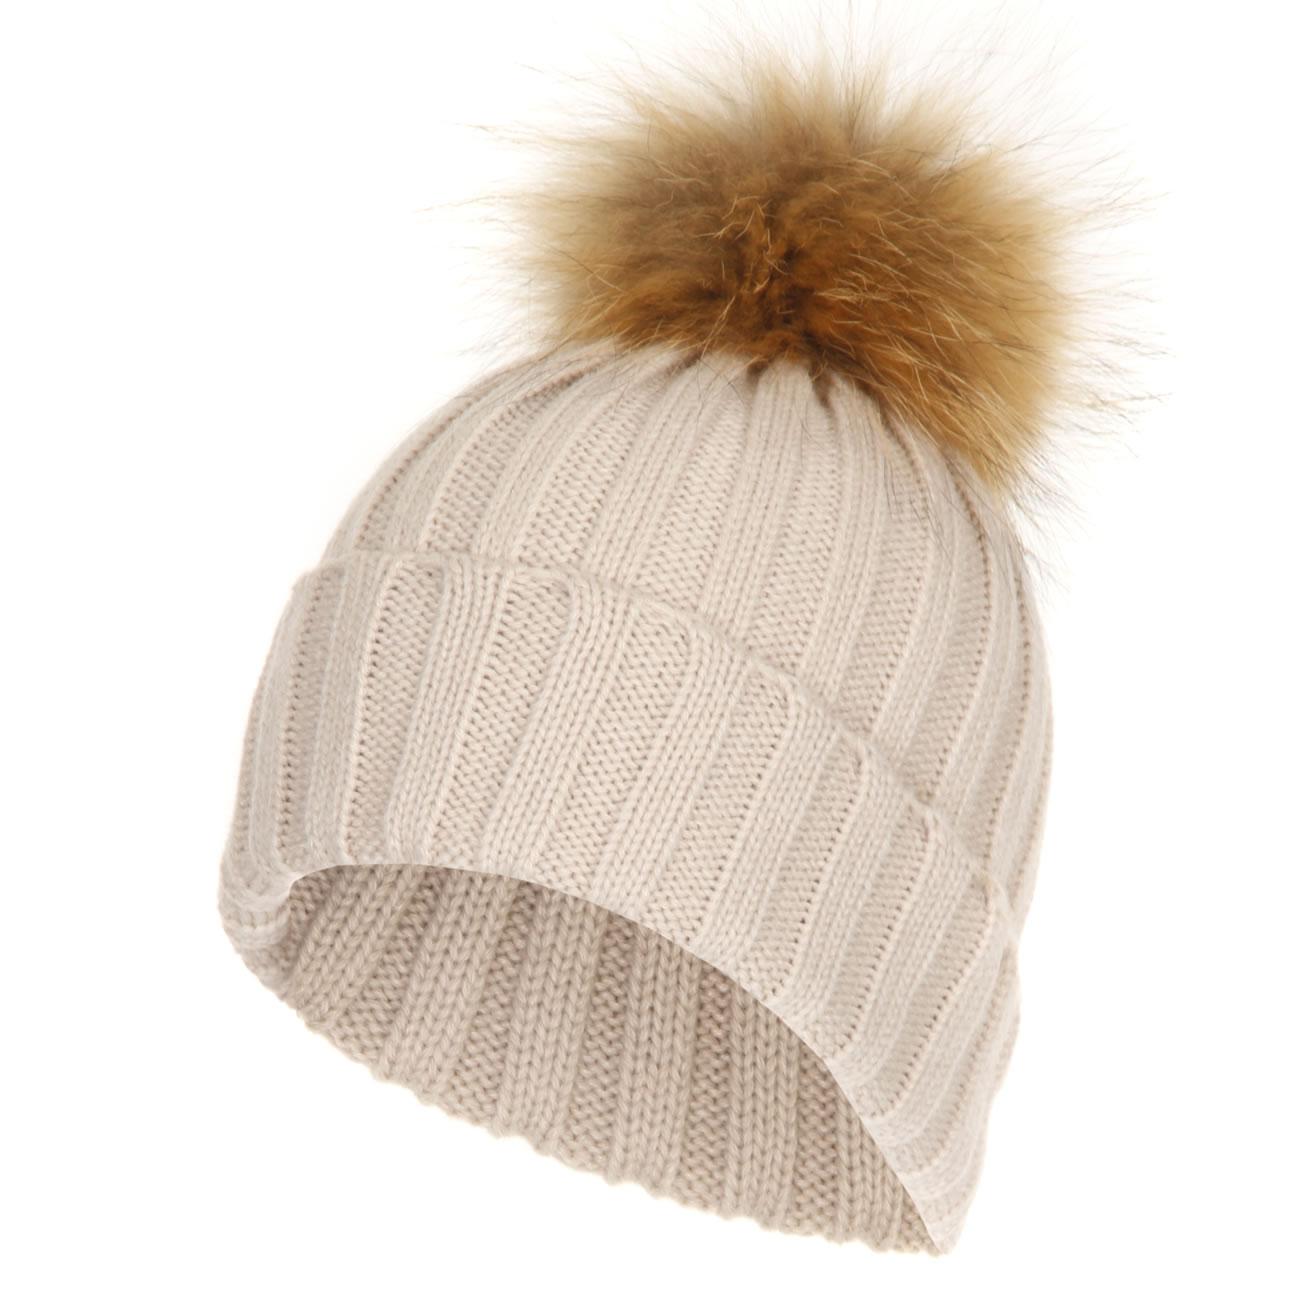 Frimble-Fur-Pom-Pom-hat-Oat.jpg